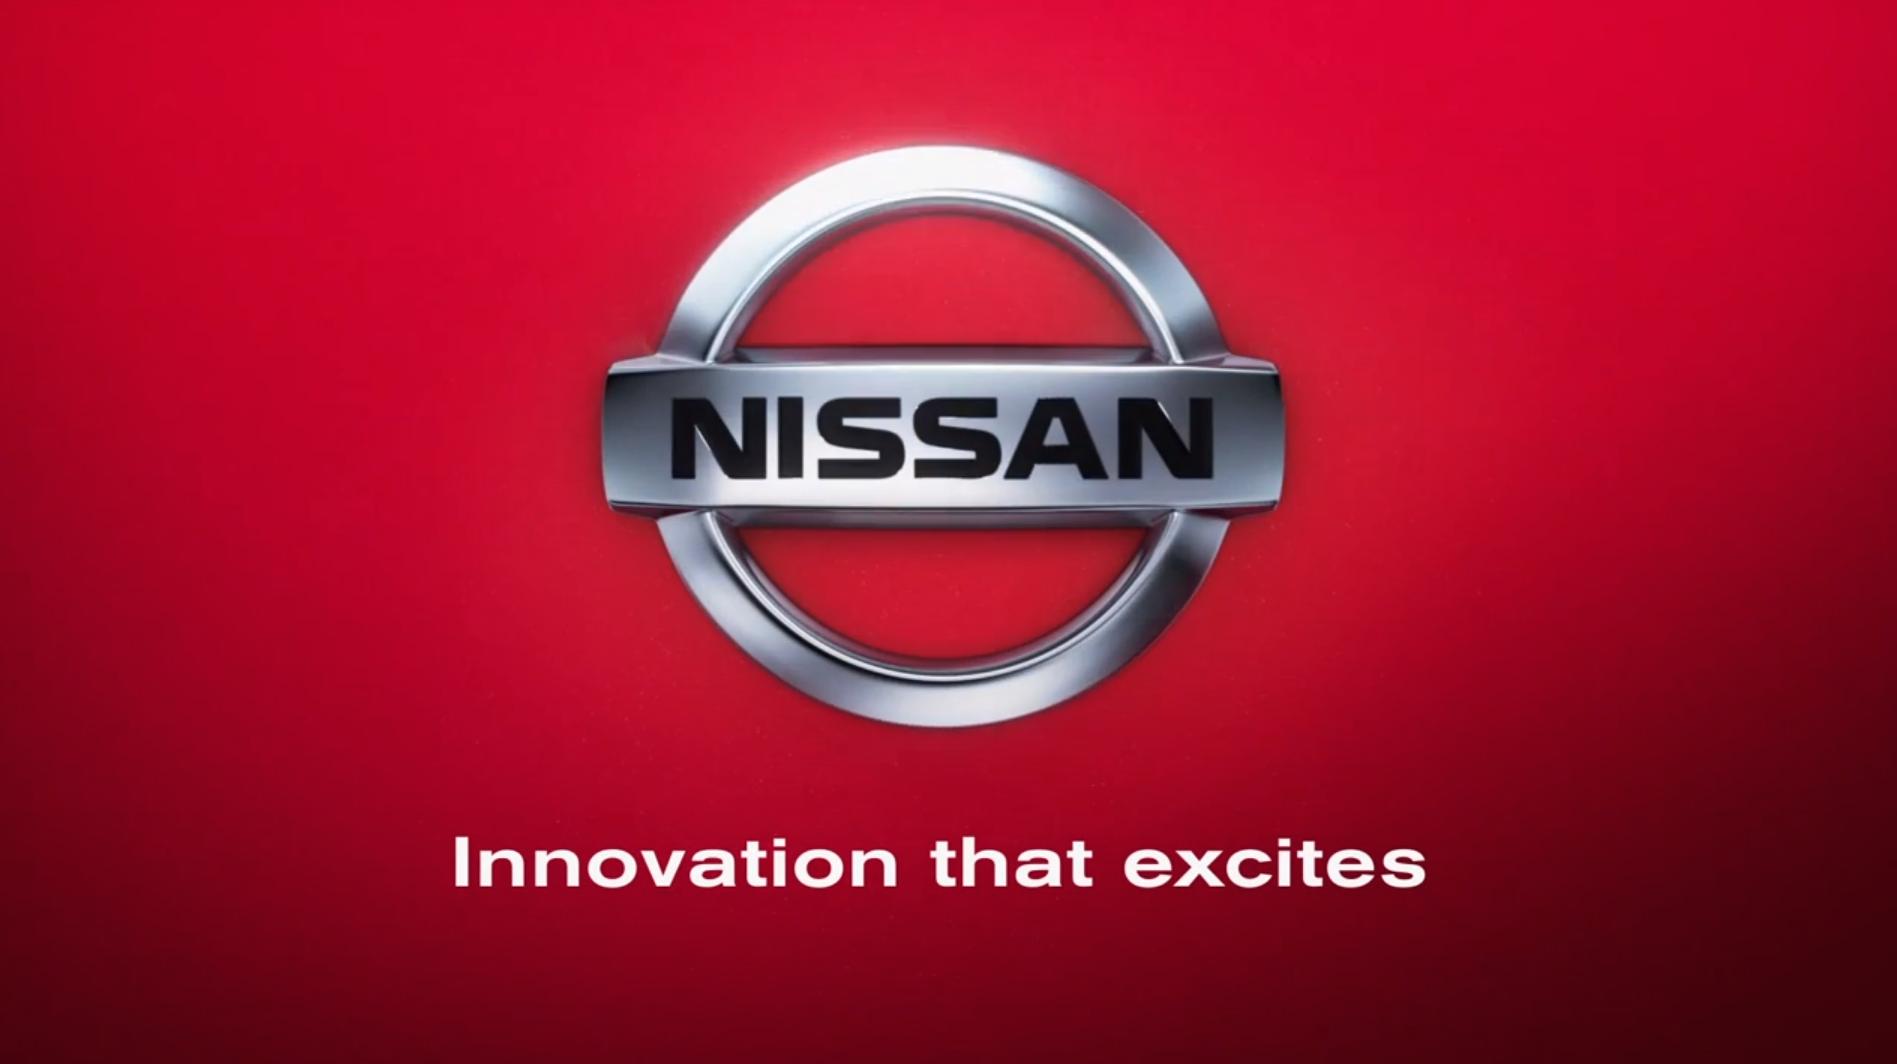 valentine's day | Nissan nv200 camper van from dinkum